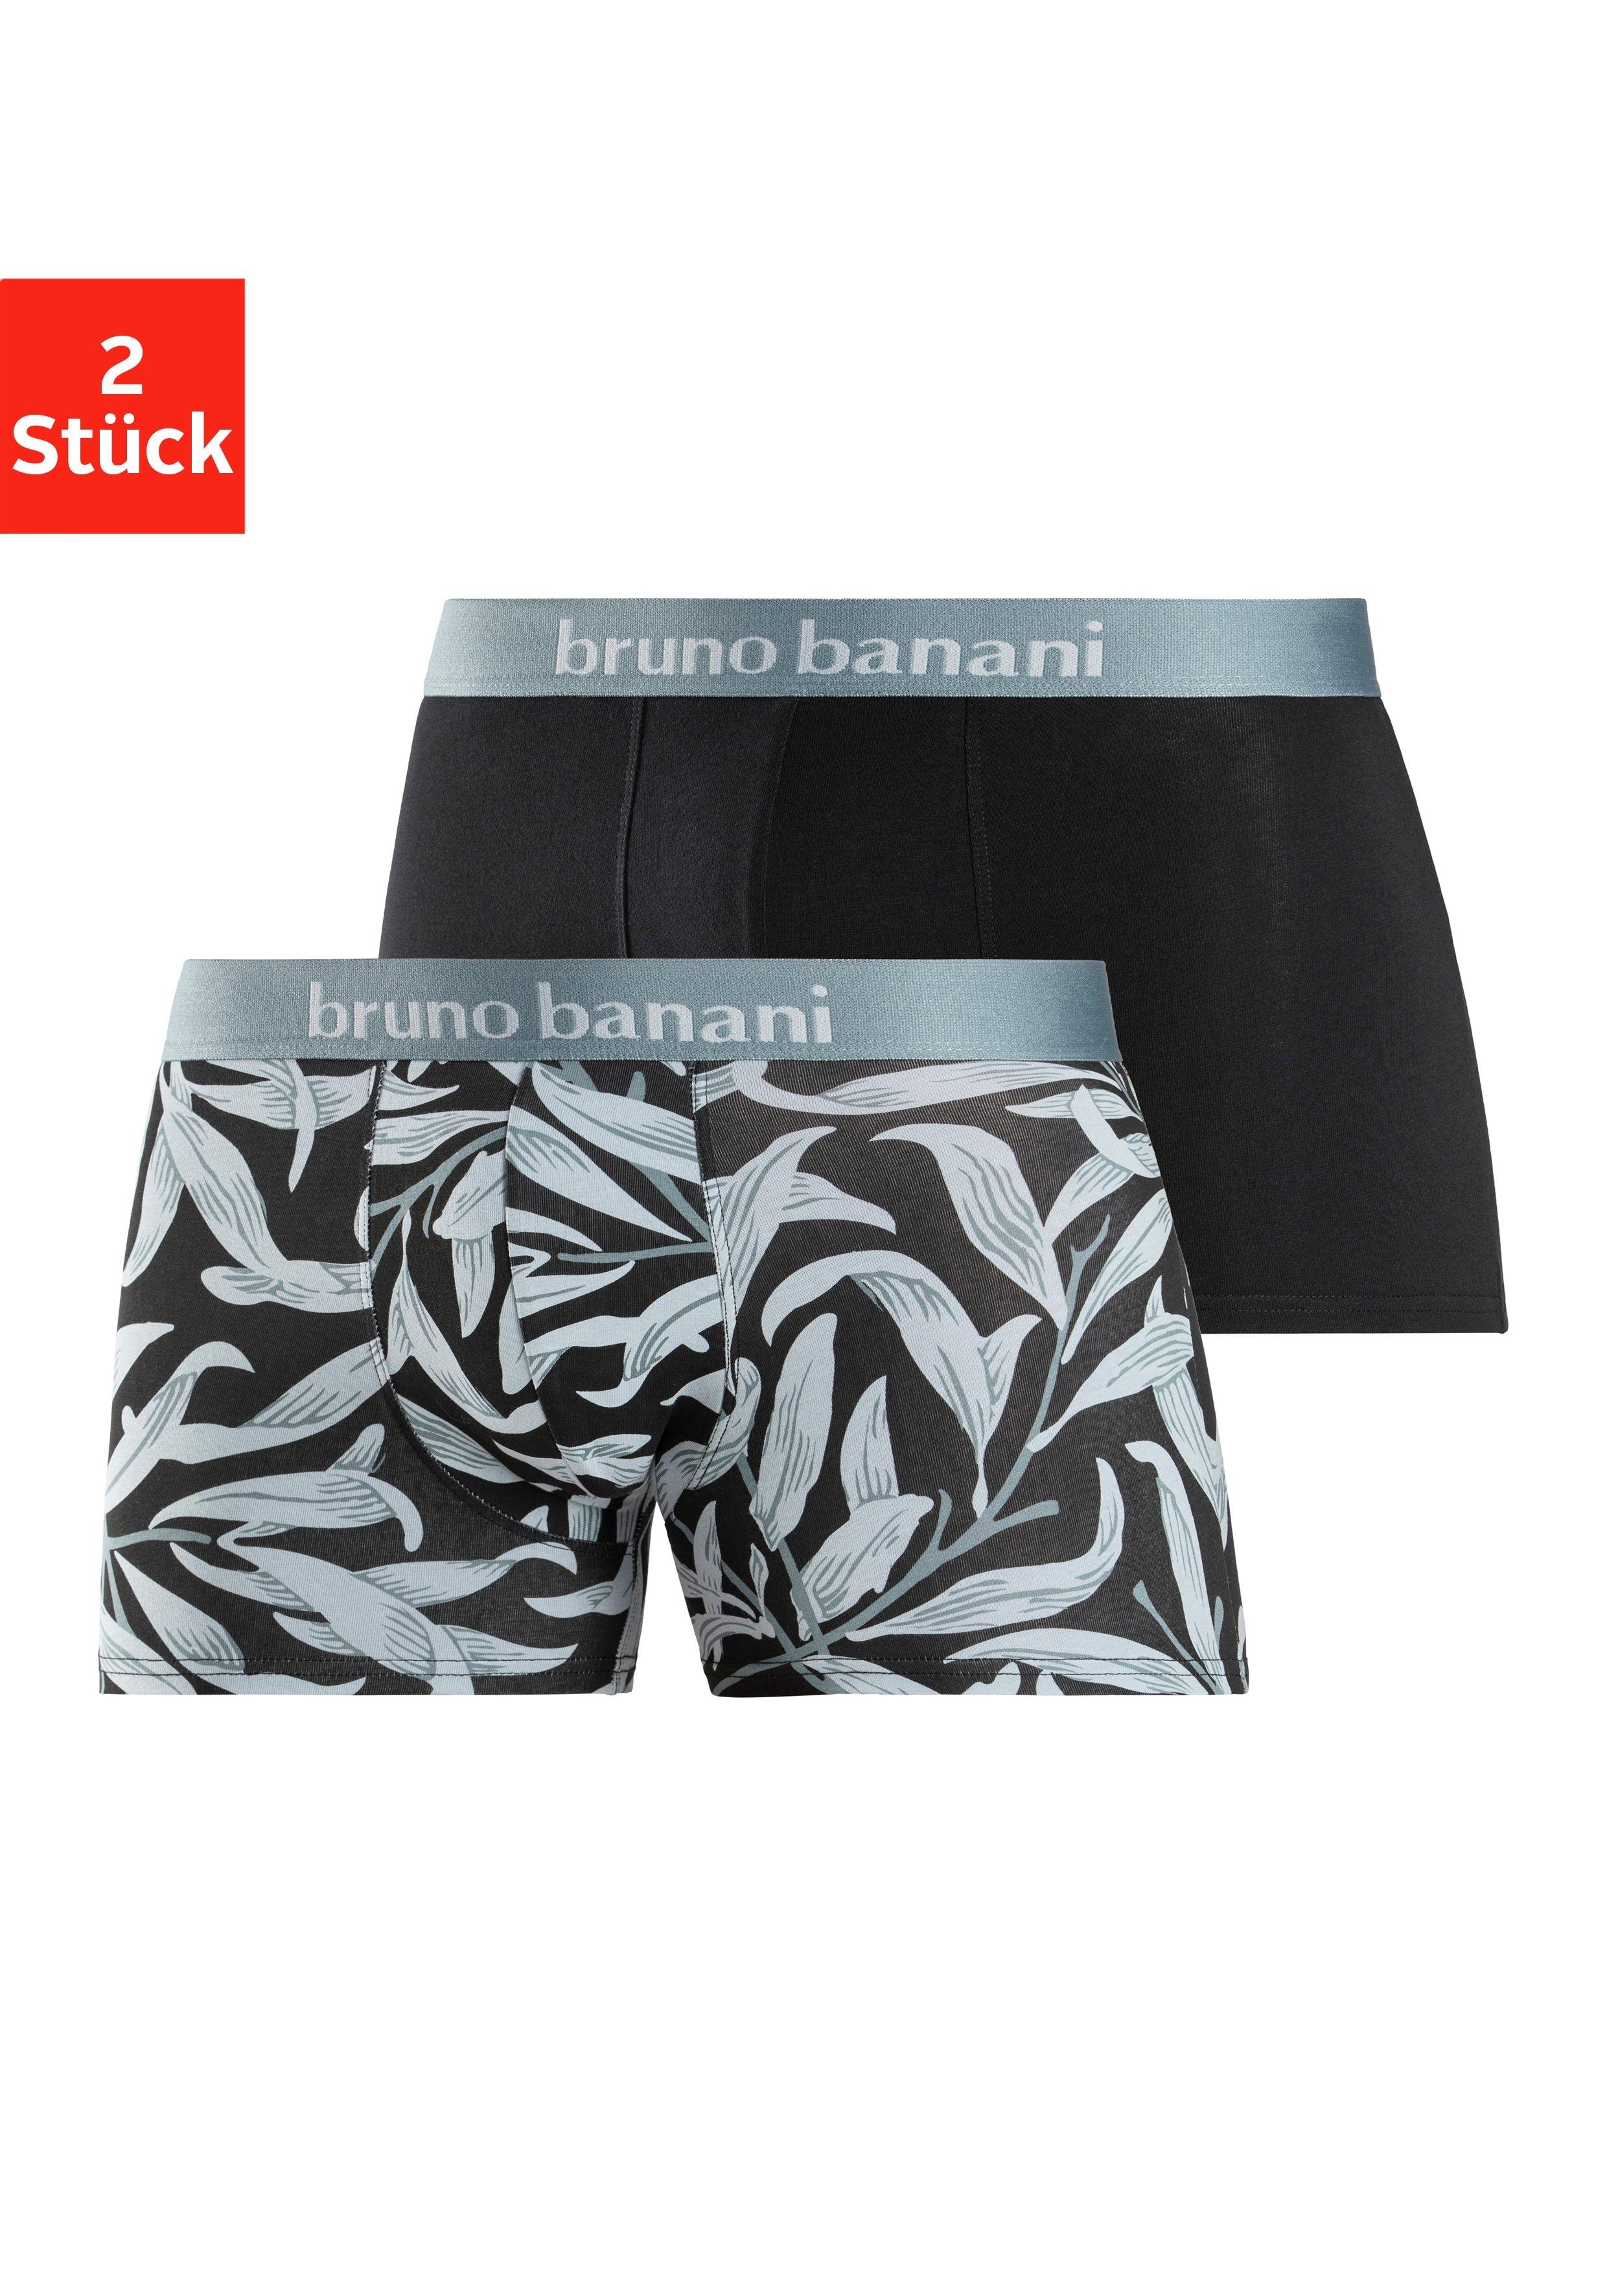 Bruno Banani Boxershort Short 2 Pack Leaf (2 stuks) goedkoop op lascana.nl kopen